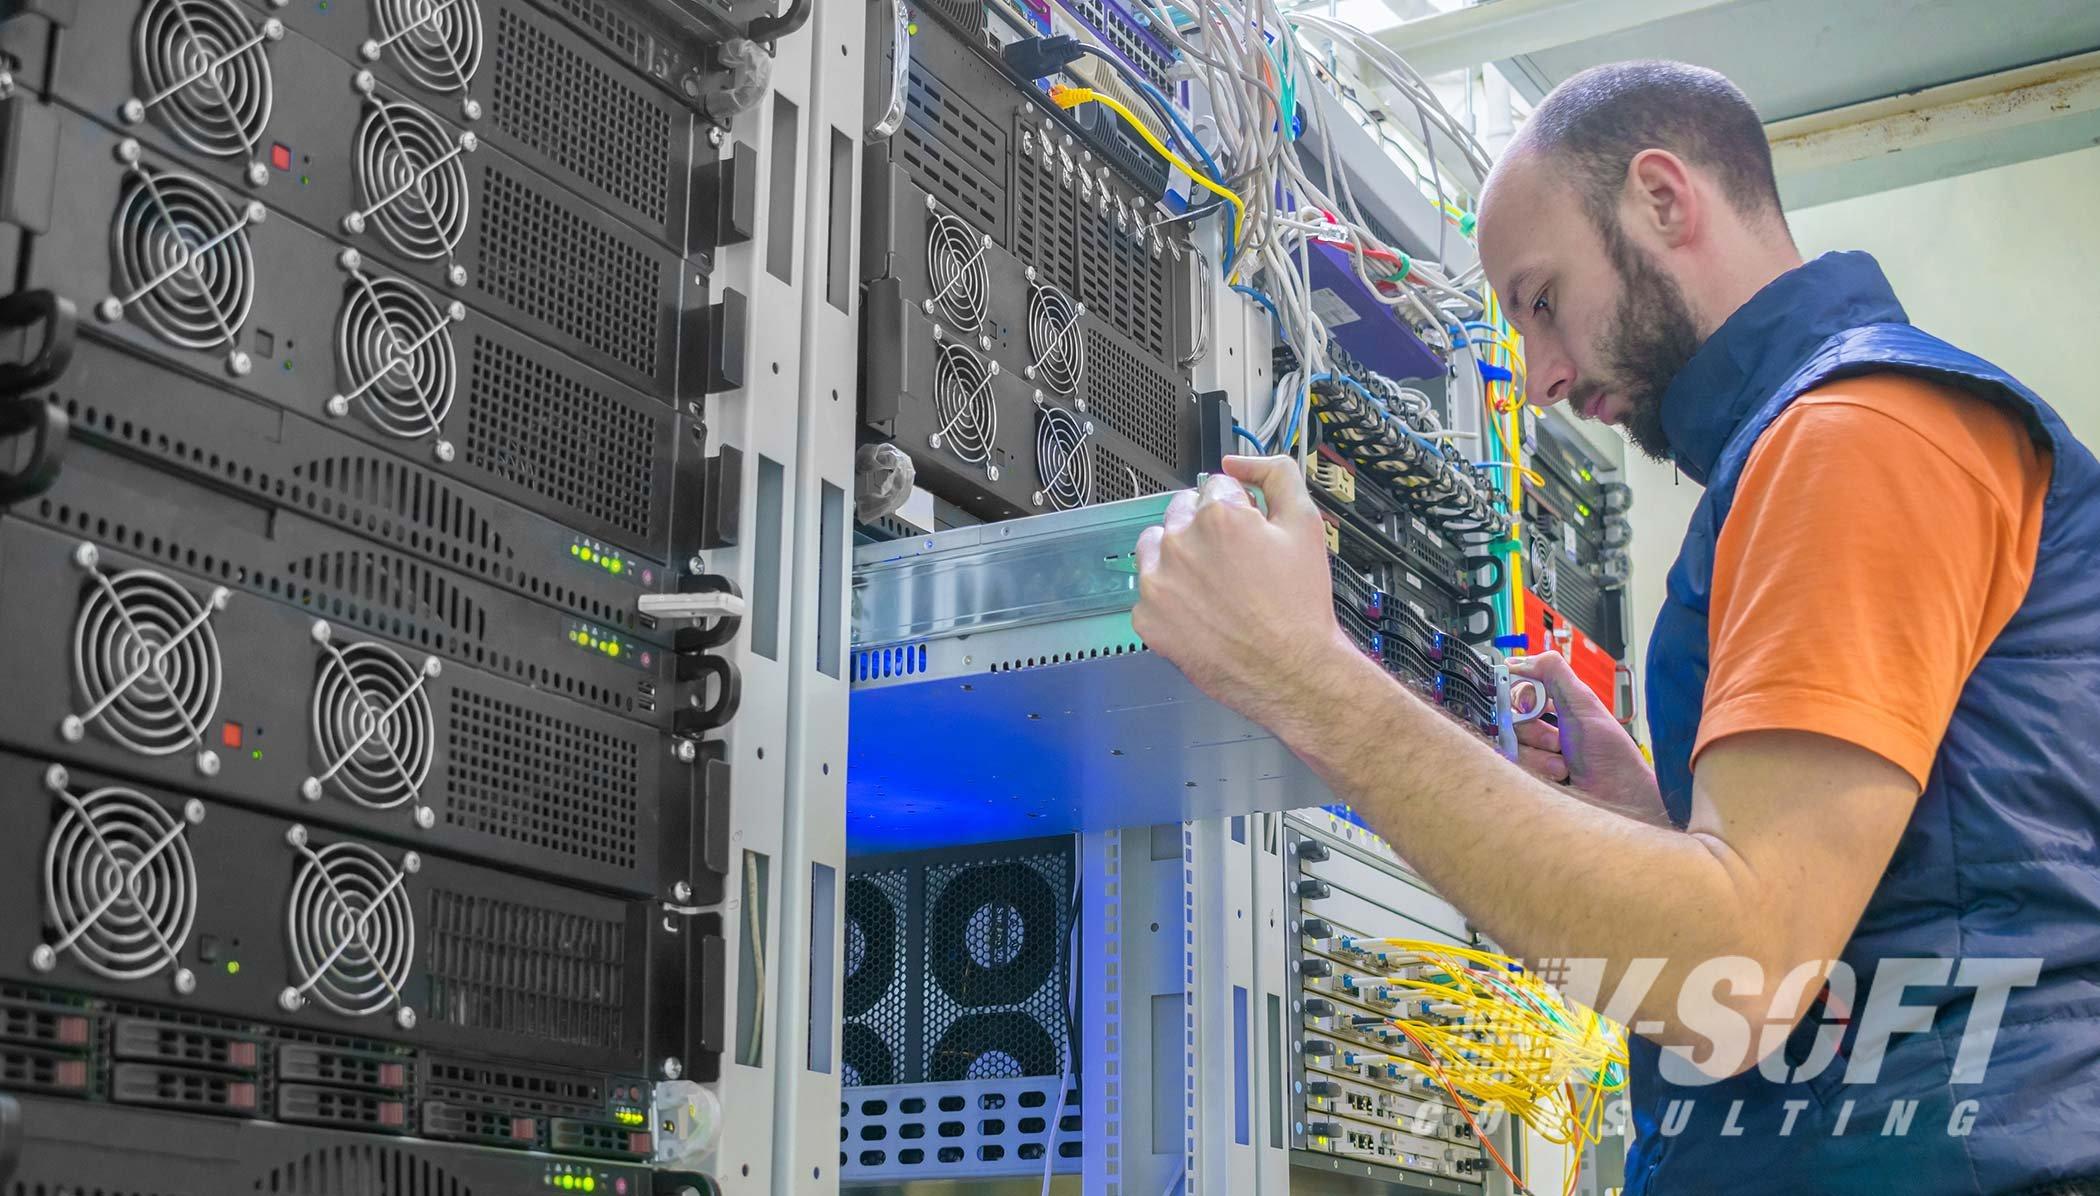 man-works-in-a-server-room_2100-X-1196-318kb